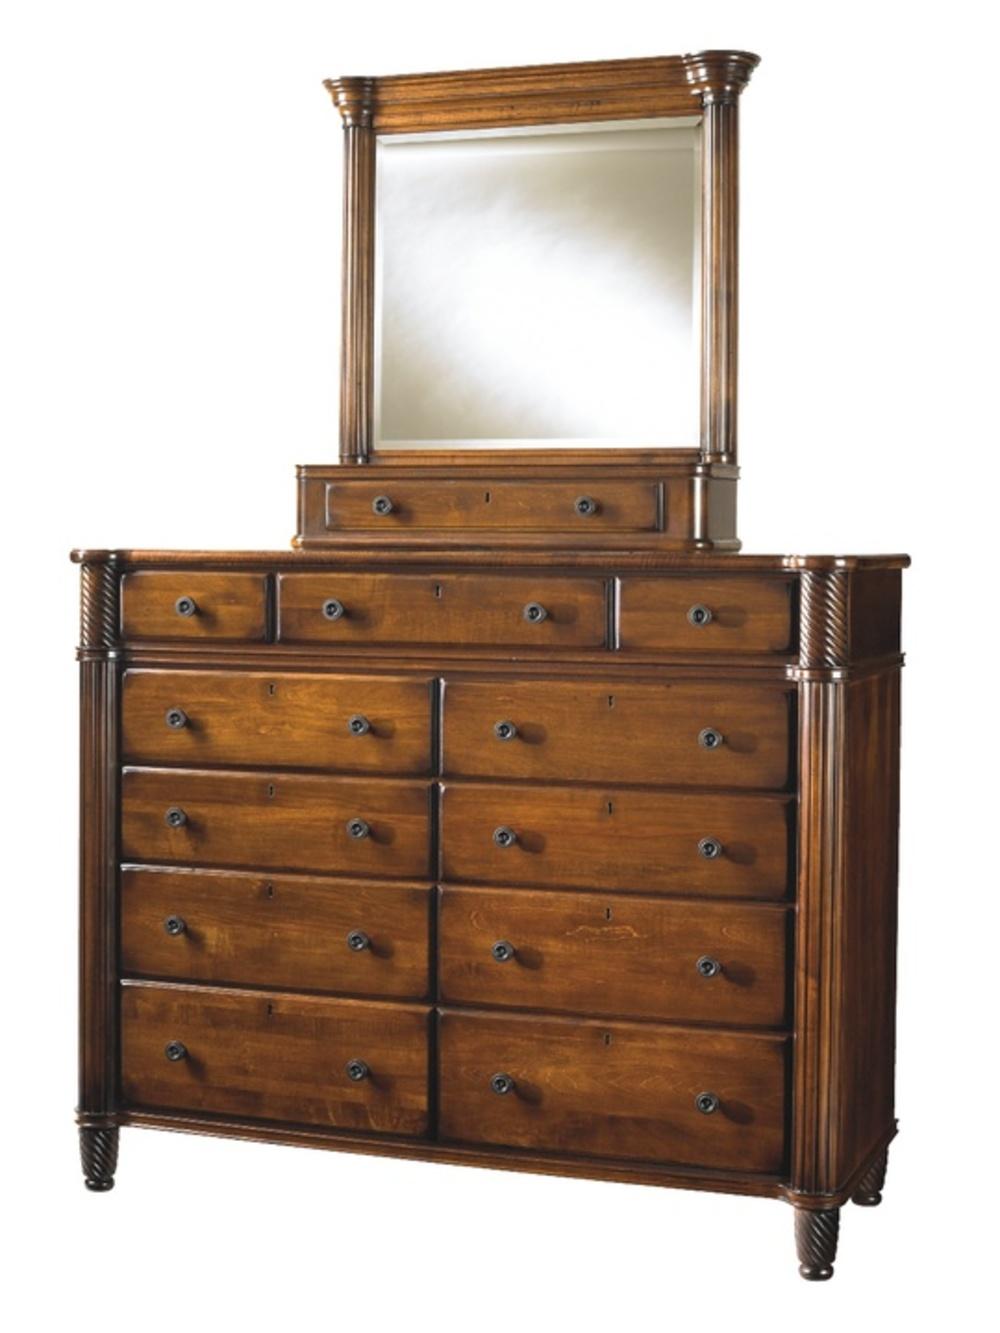 Durham Furniture - Dressing Chest